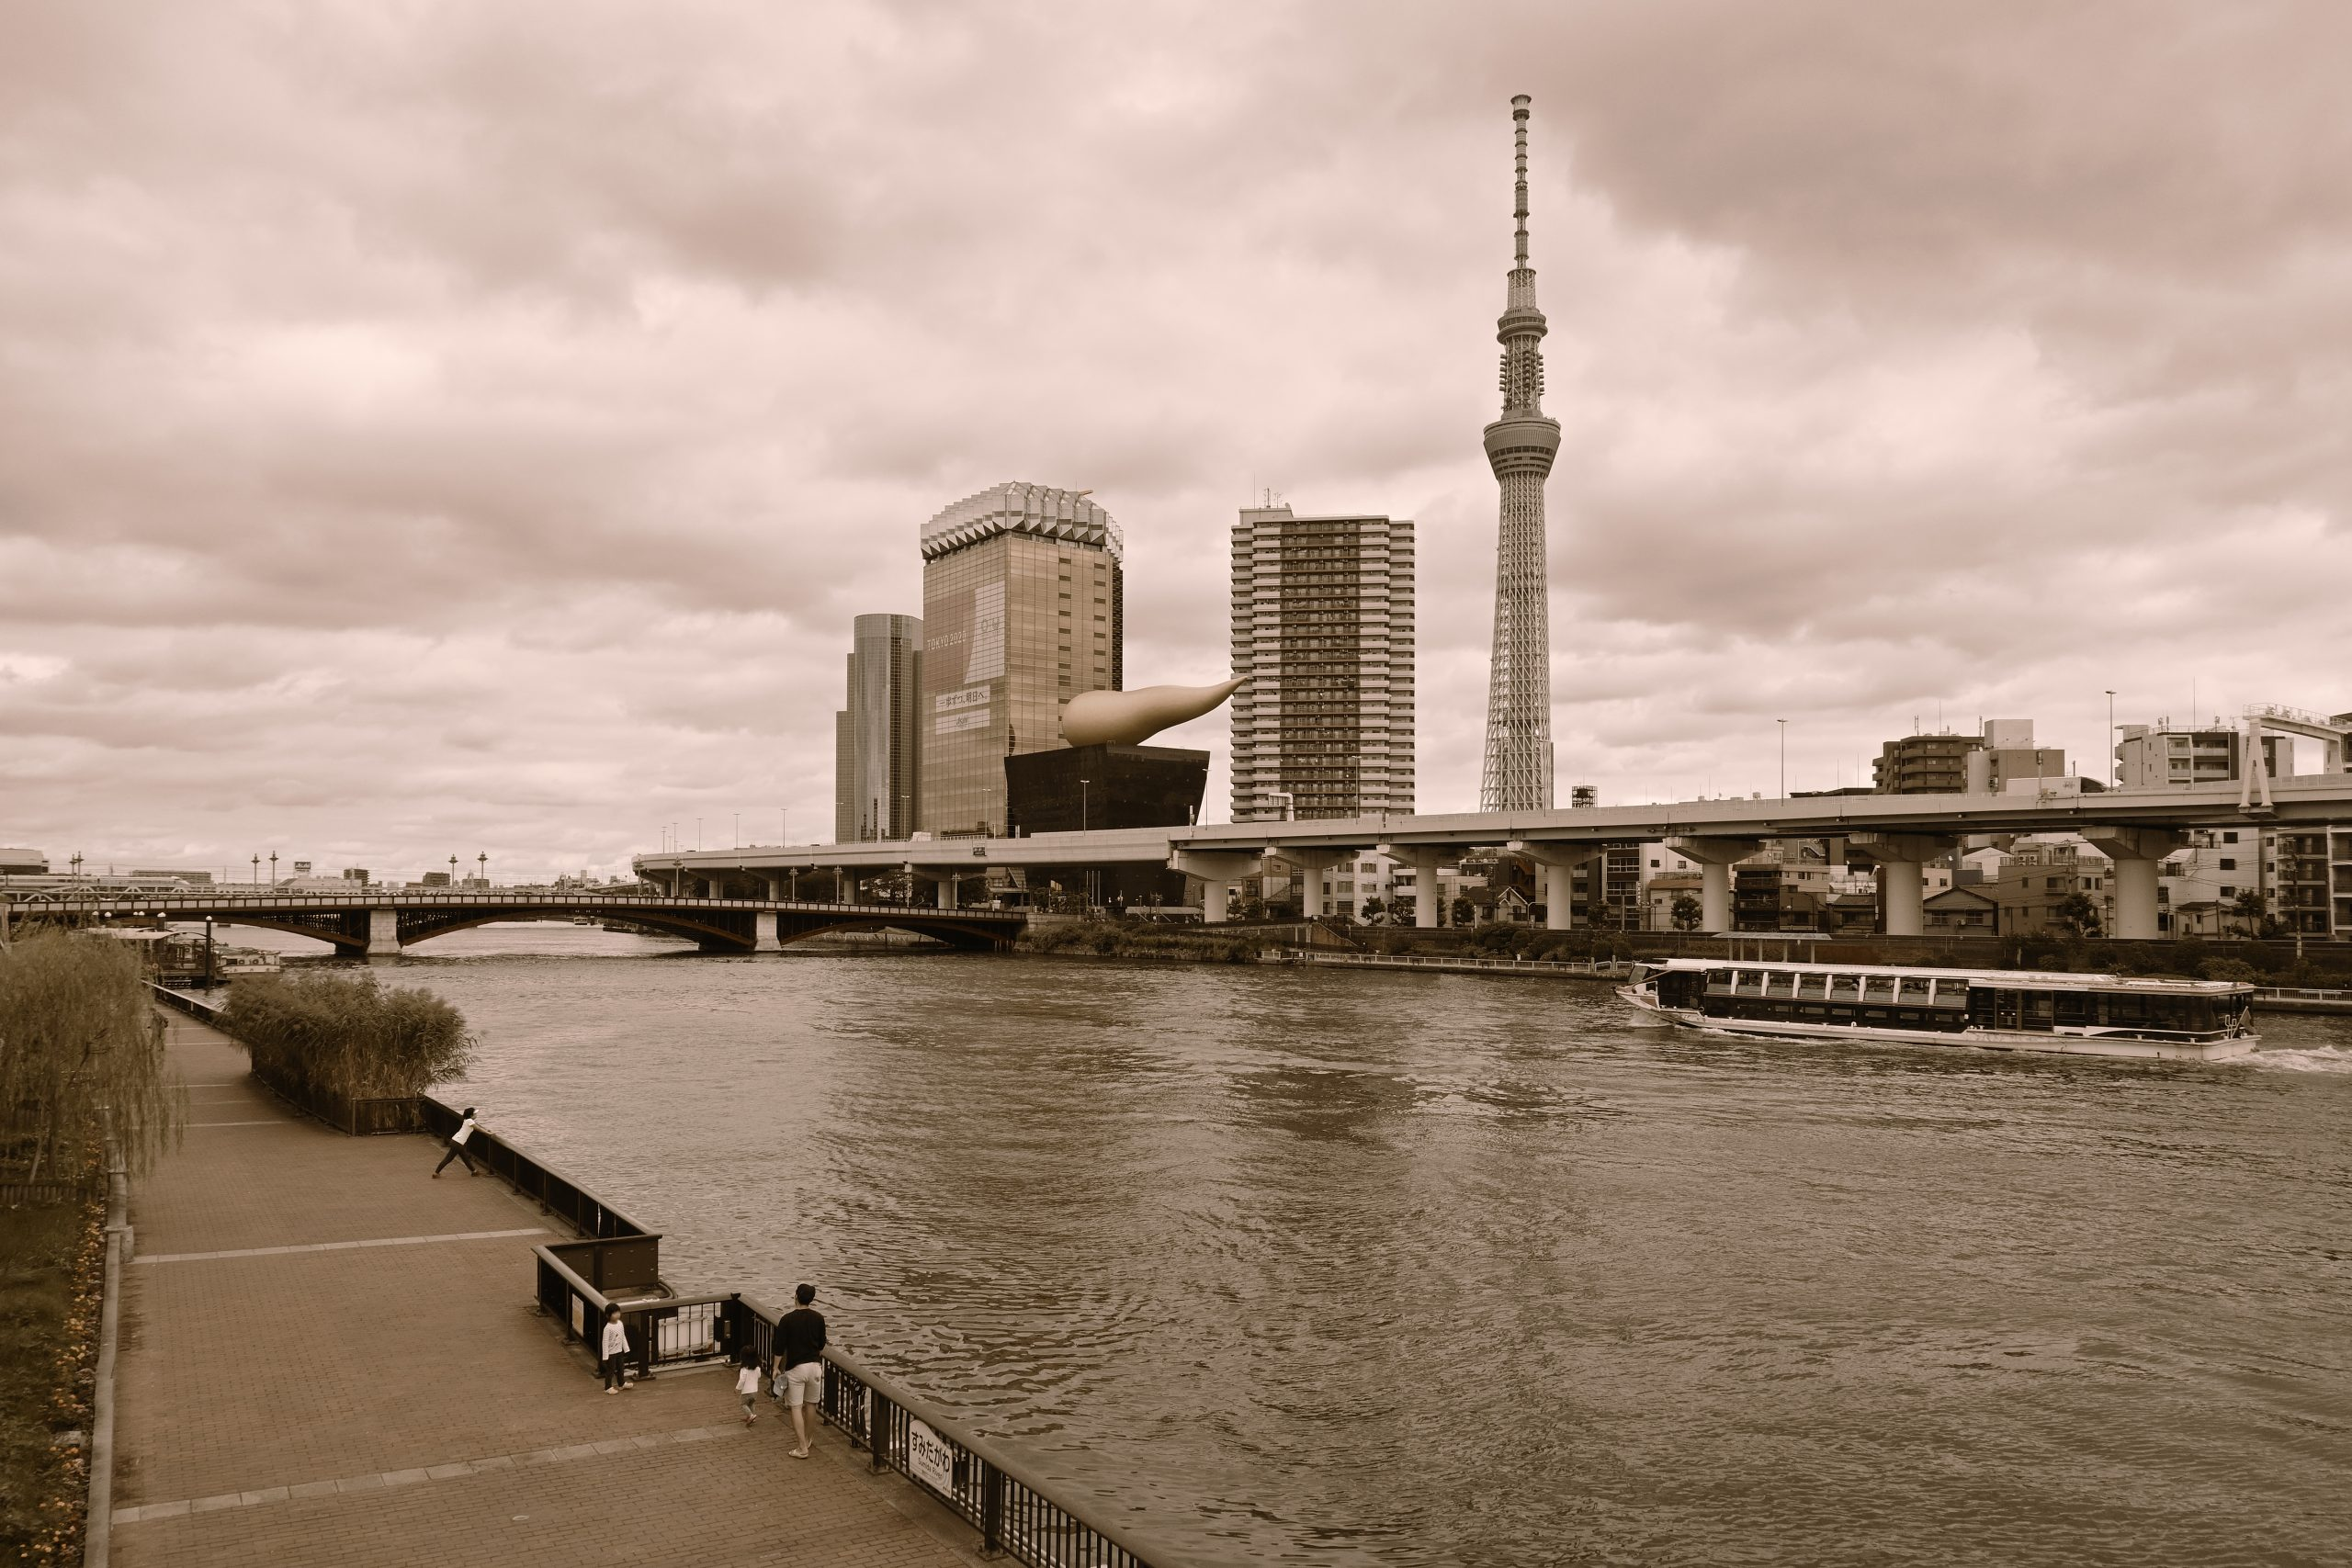 【Nikon】 Z50で浅草・御徒町をスナップ撮影